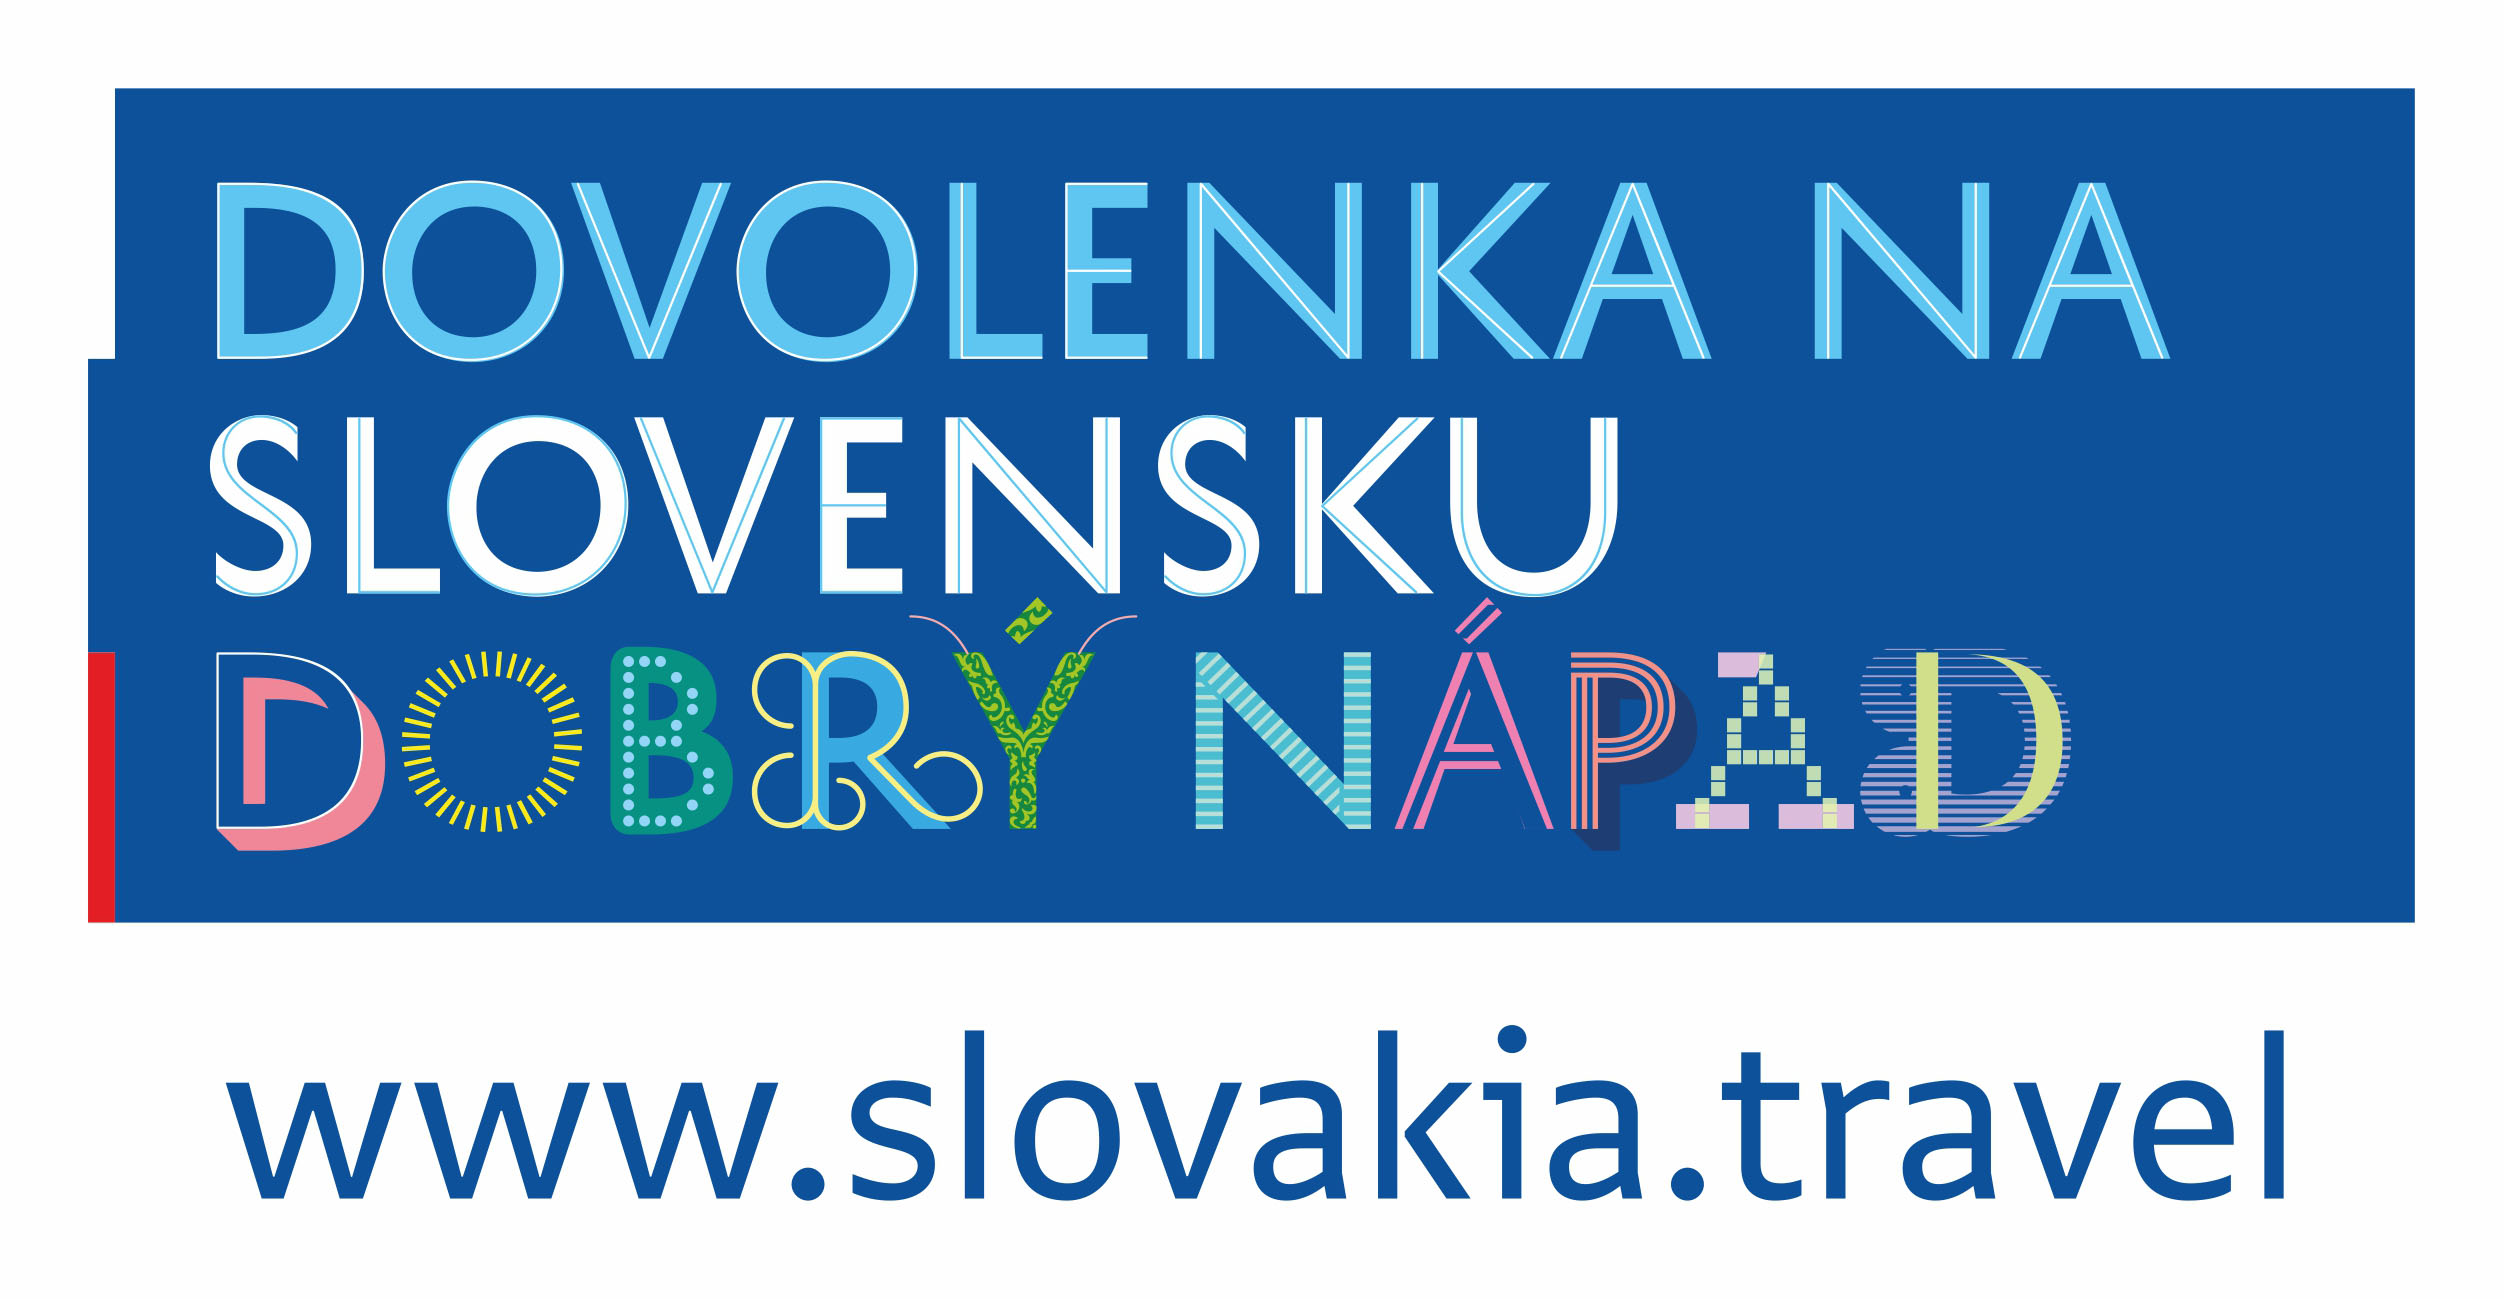 ministerstvo 2020 dovolenka na slovensku dobrý nápad